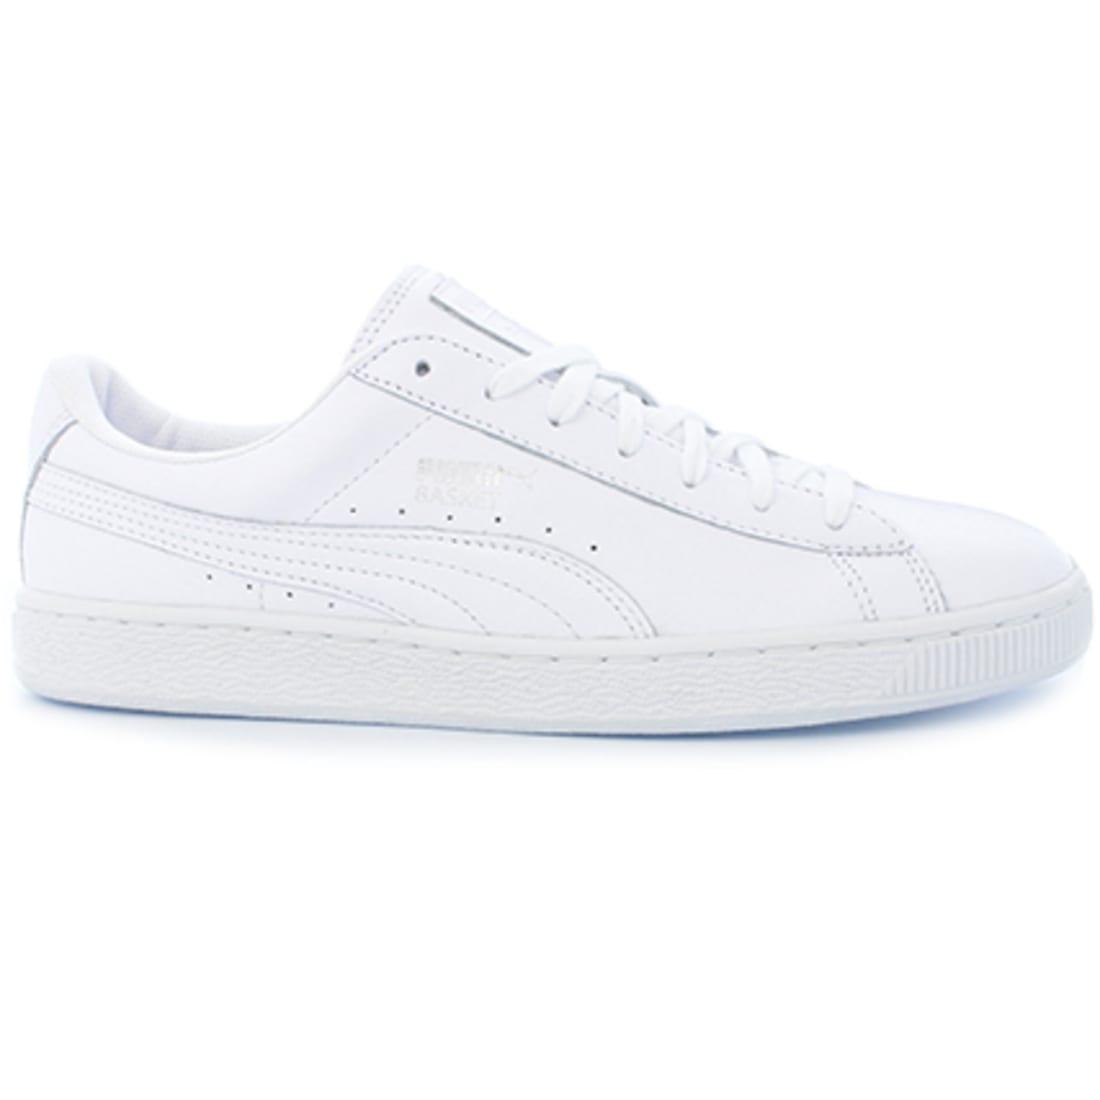 Puma Baskets Classic LFS Mono 362202 01 White Puma Silver